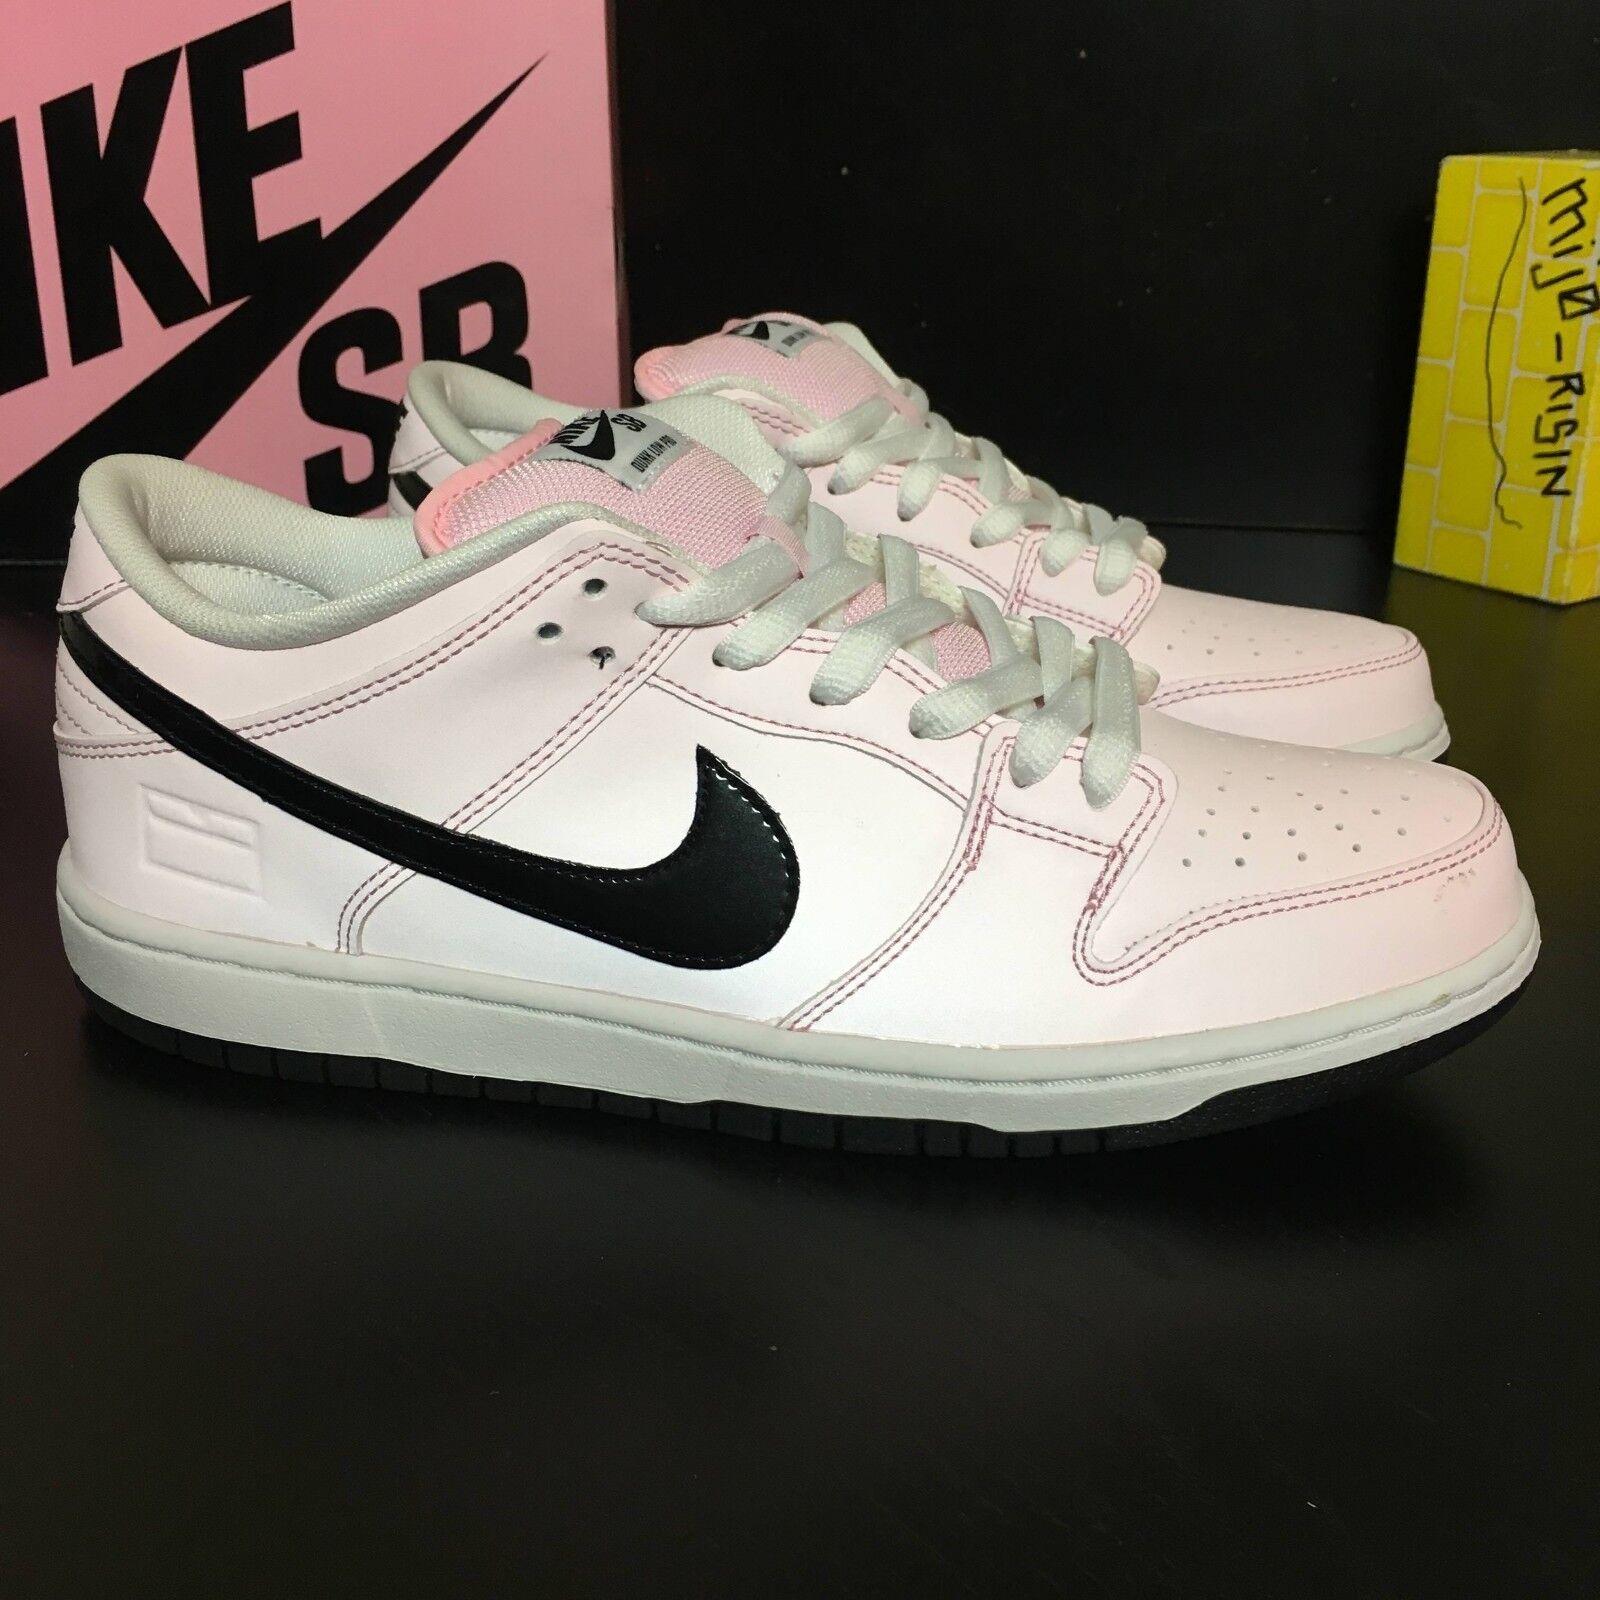 finest selection 2bec4 fab87 Nueva Nike SB Dunk bajas Elite 3M caja caja caja rosa Prism Rosa hombres  cómodos el